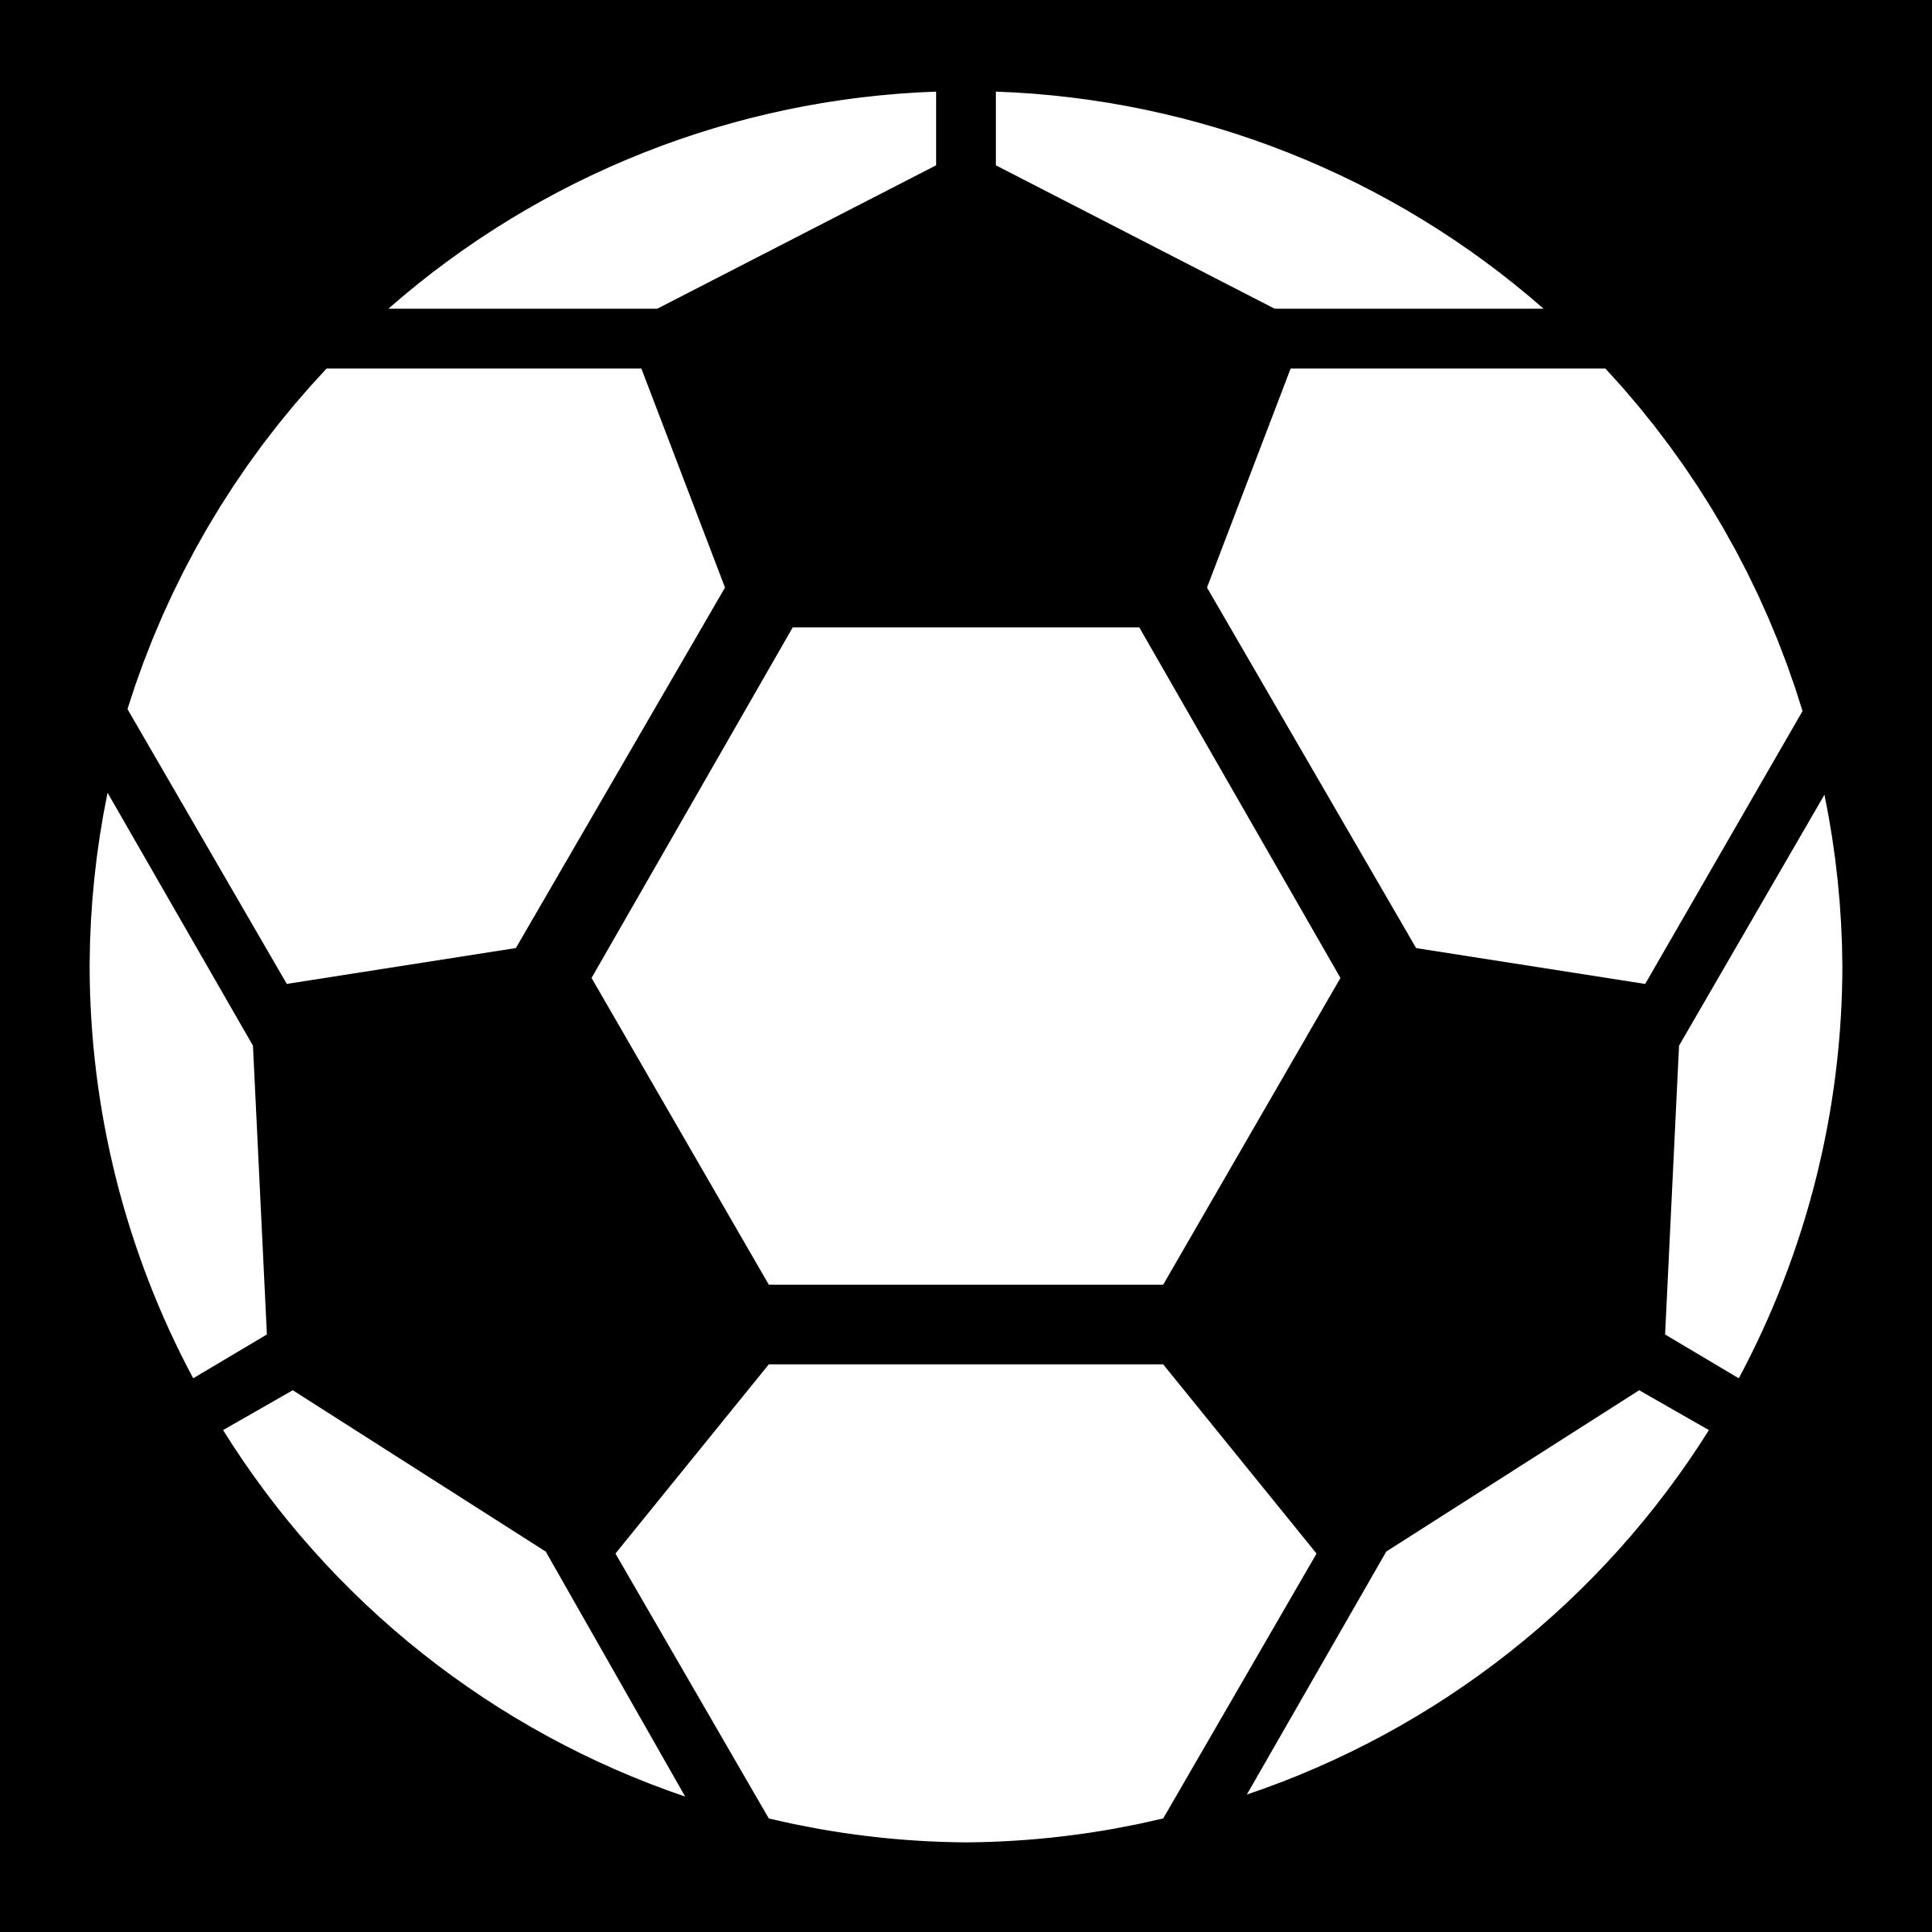 Simple clipart soccer ball Ball Clipart clipartcow soccer clip